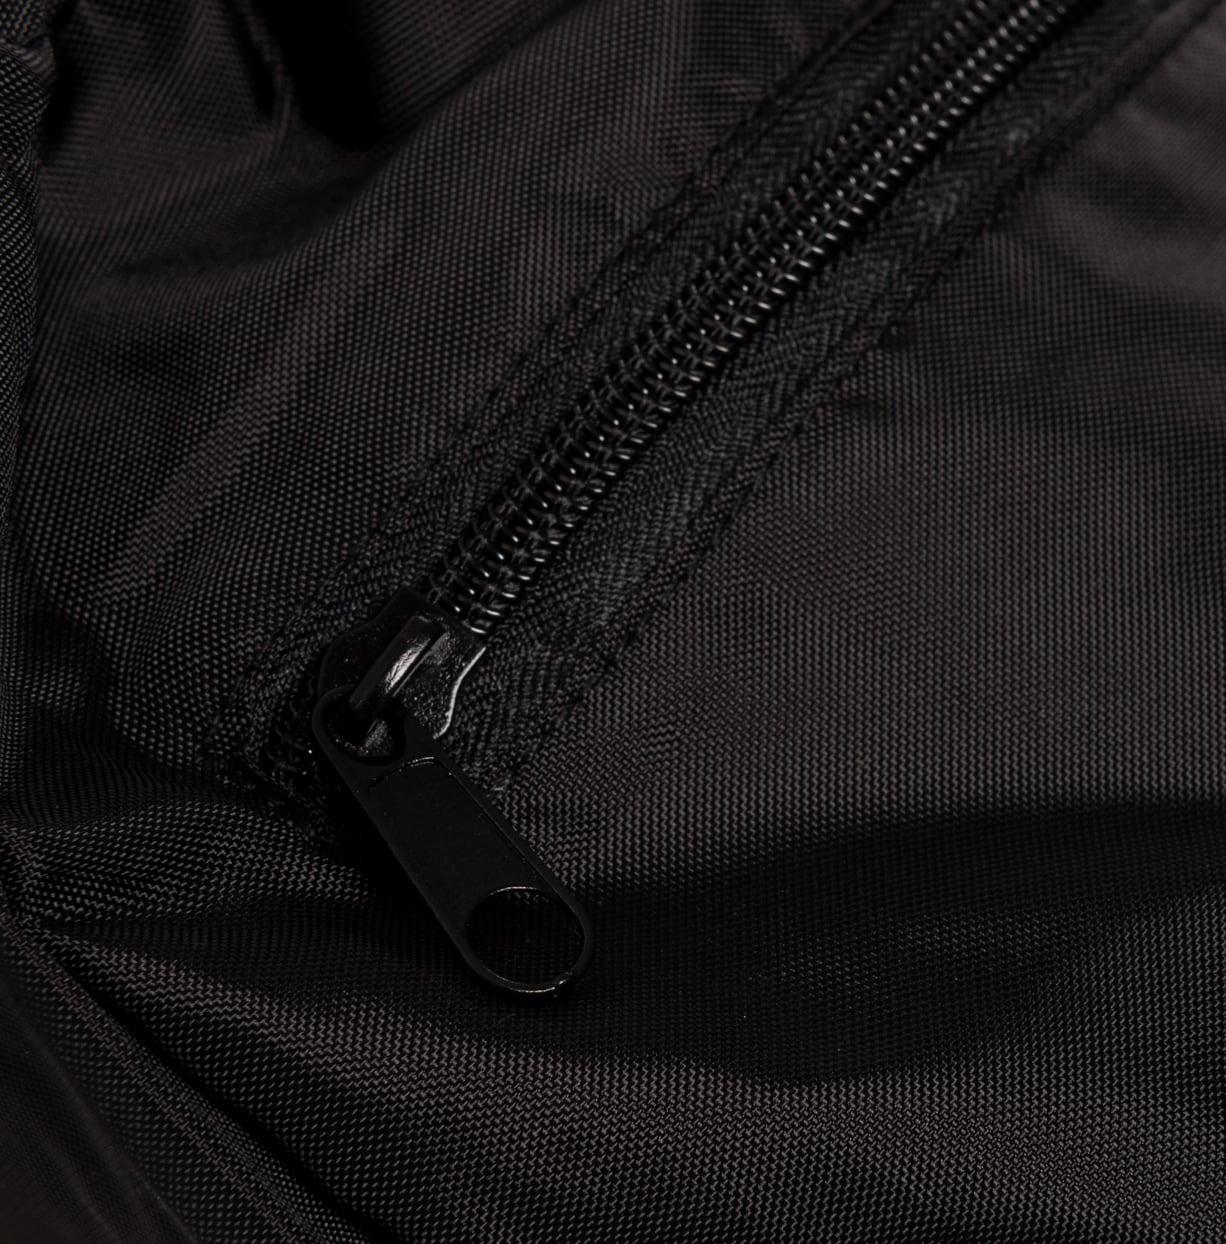 cln-gymnastic-bag-detail